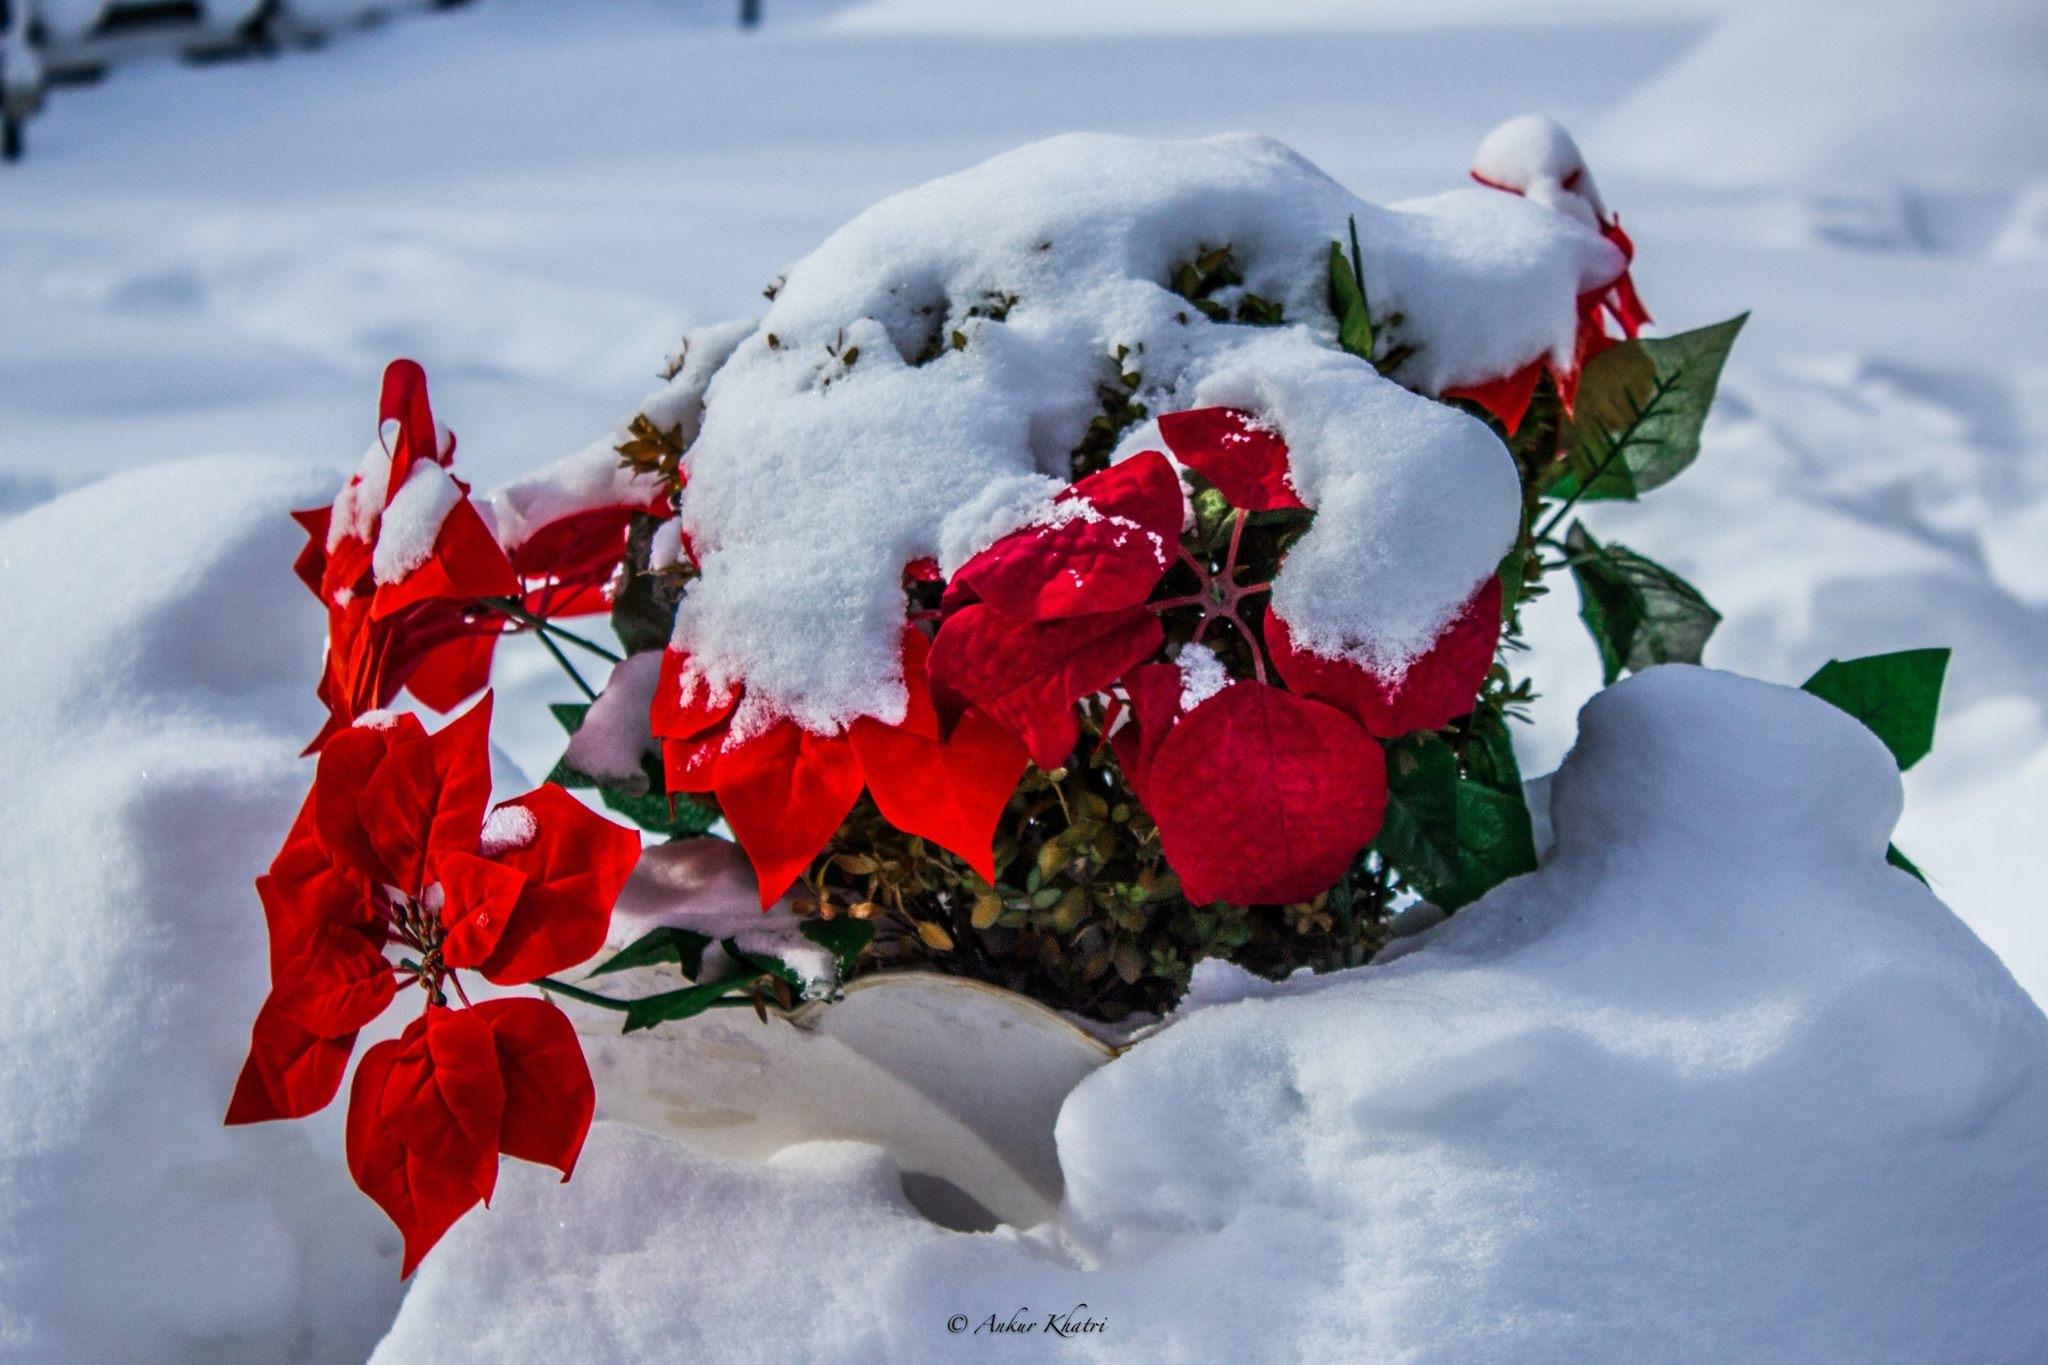 Snow covered flowers by Ankur Khatri